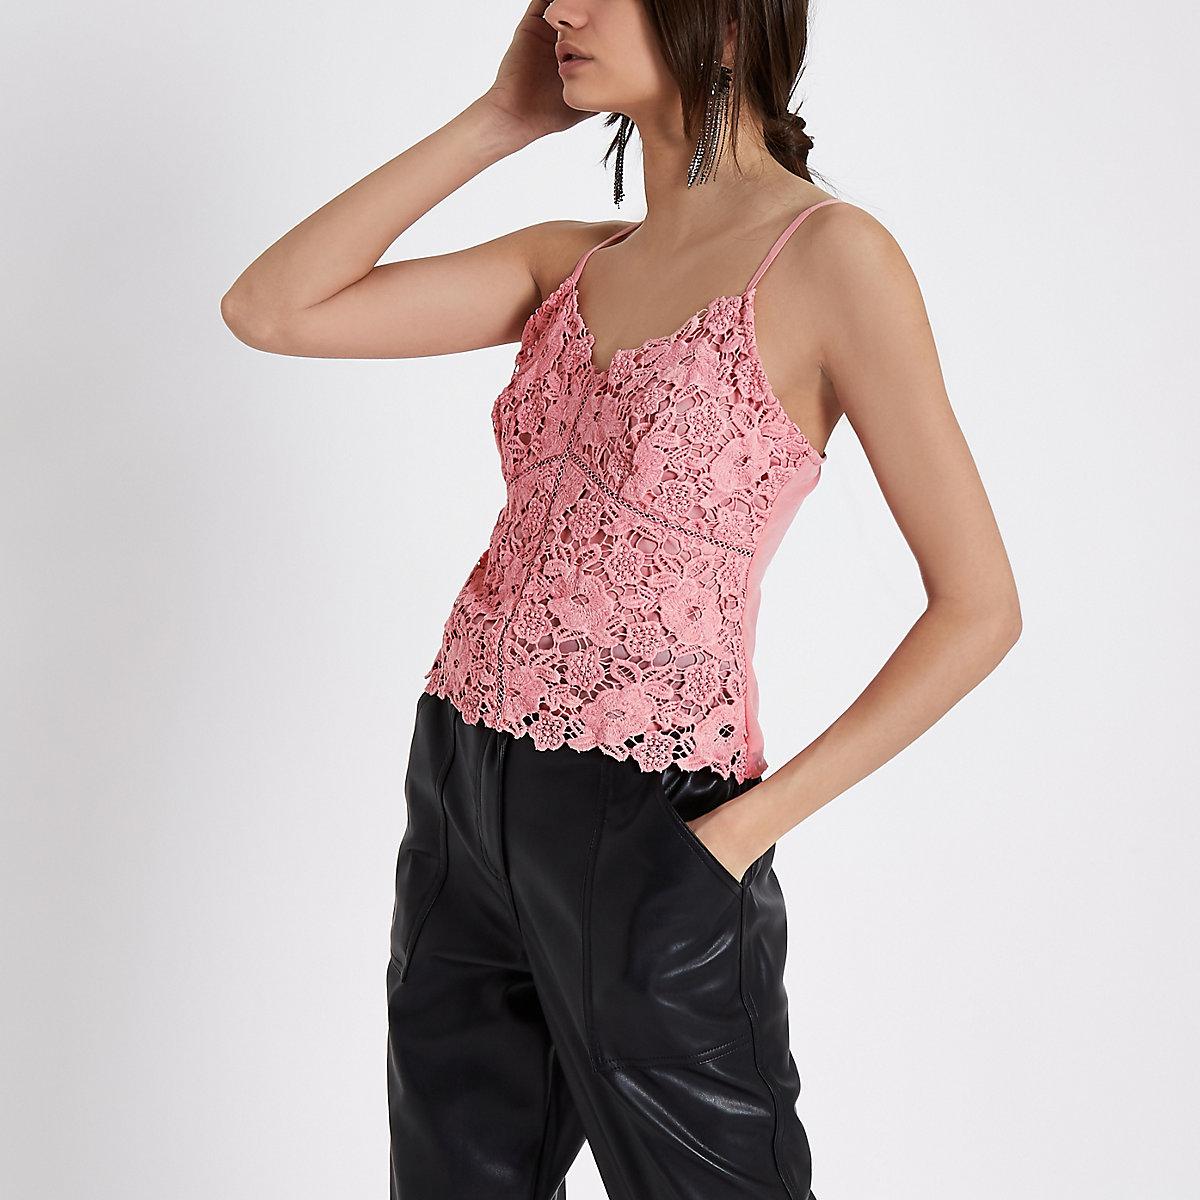 Light pink lace cami bralette